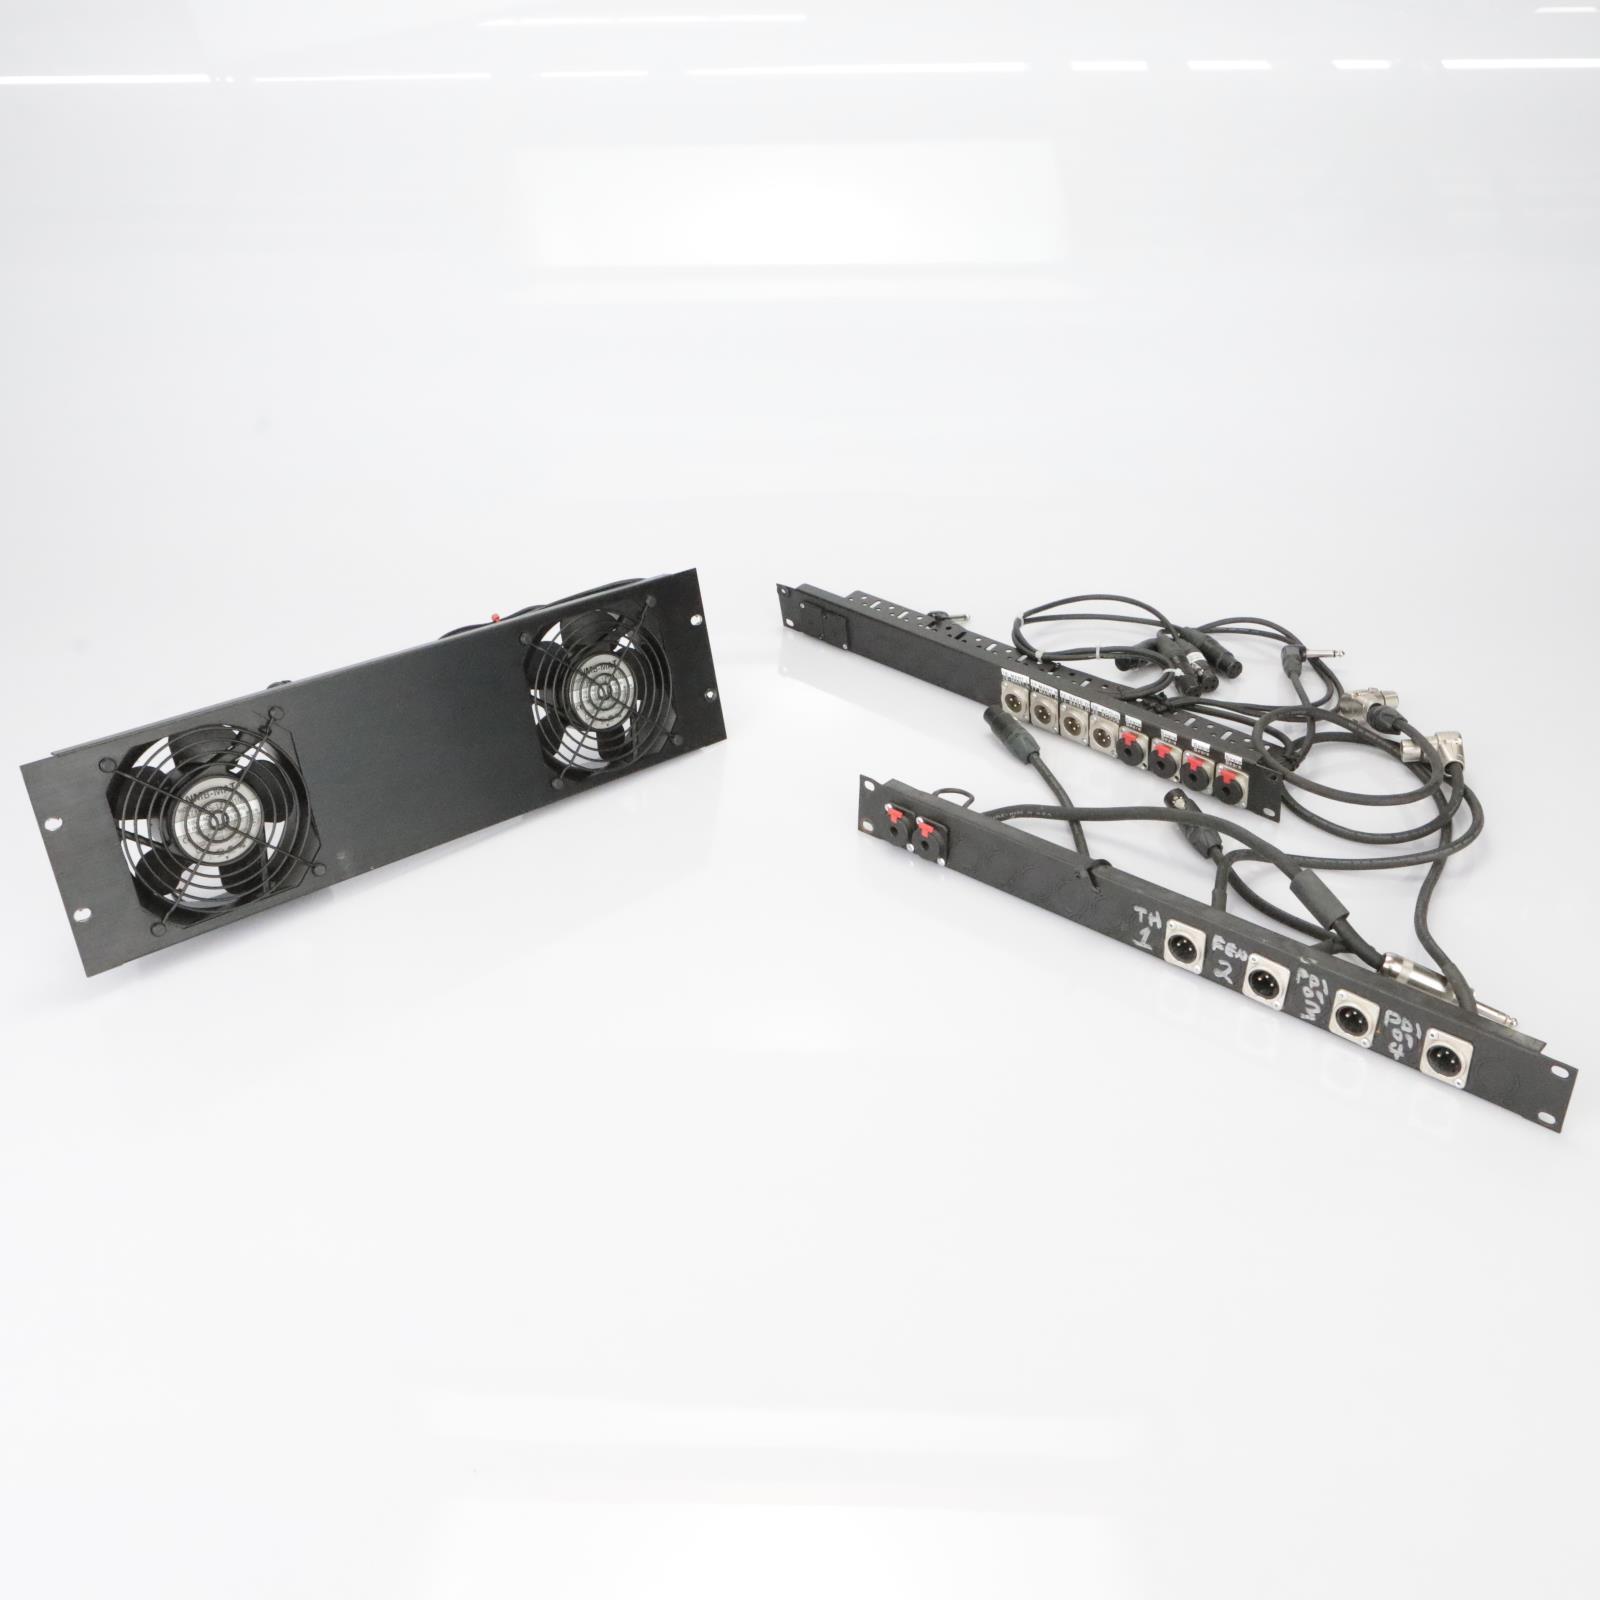 2 Instrument Bass Amp Acoustic Guitar DI Box Patchbay Racks w/ Fans  #39477